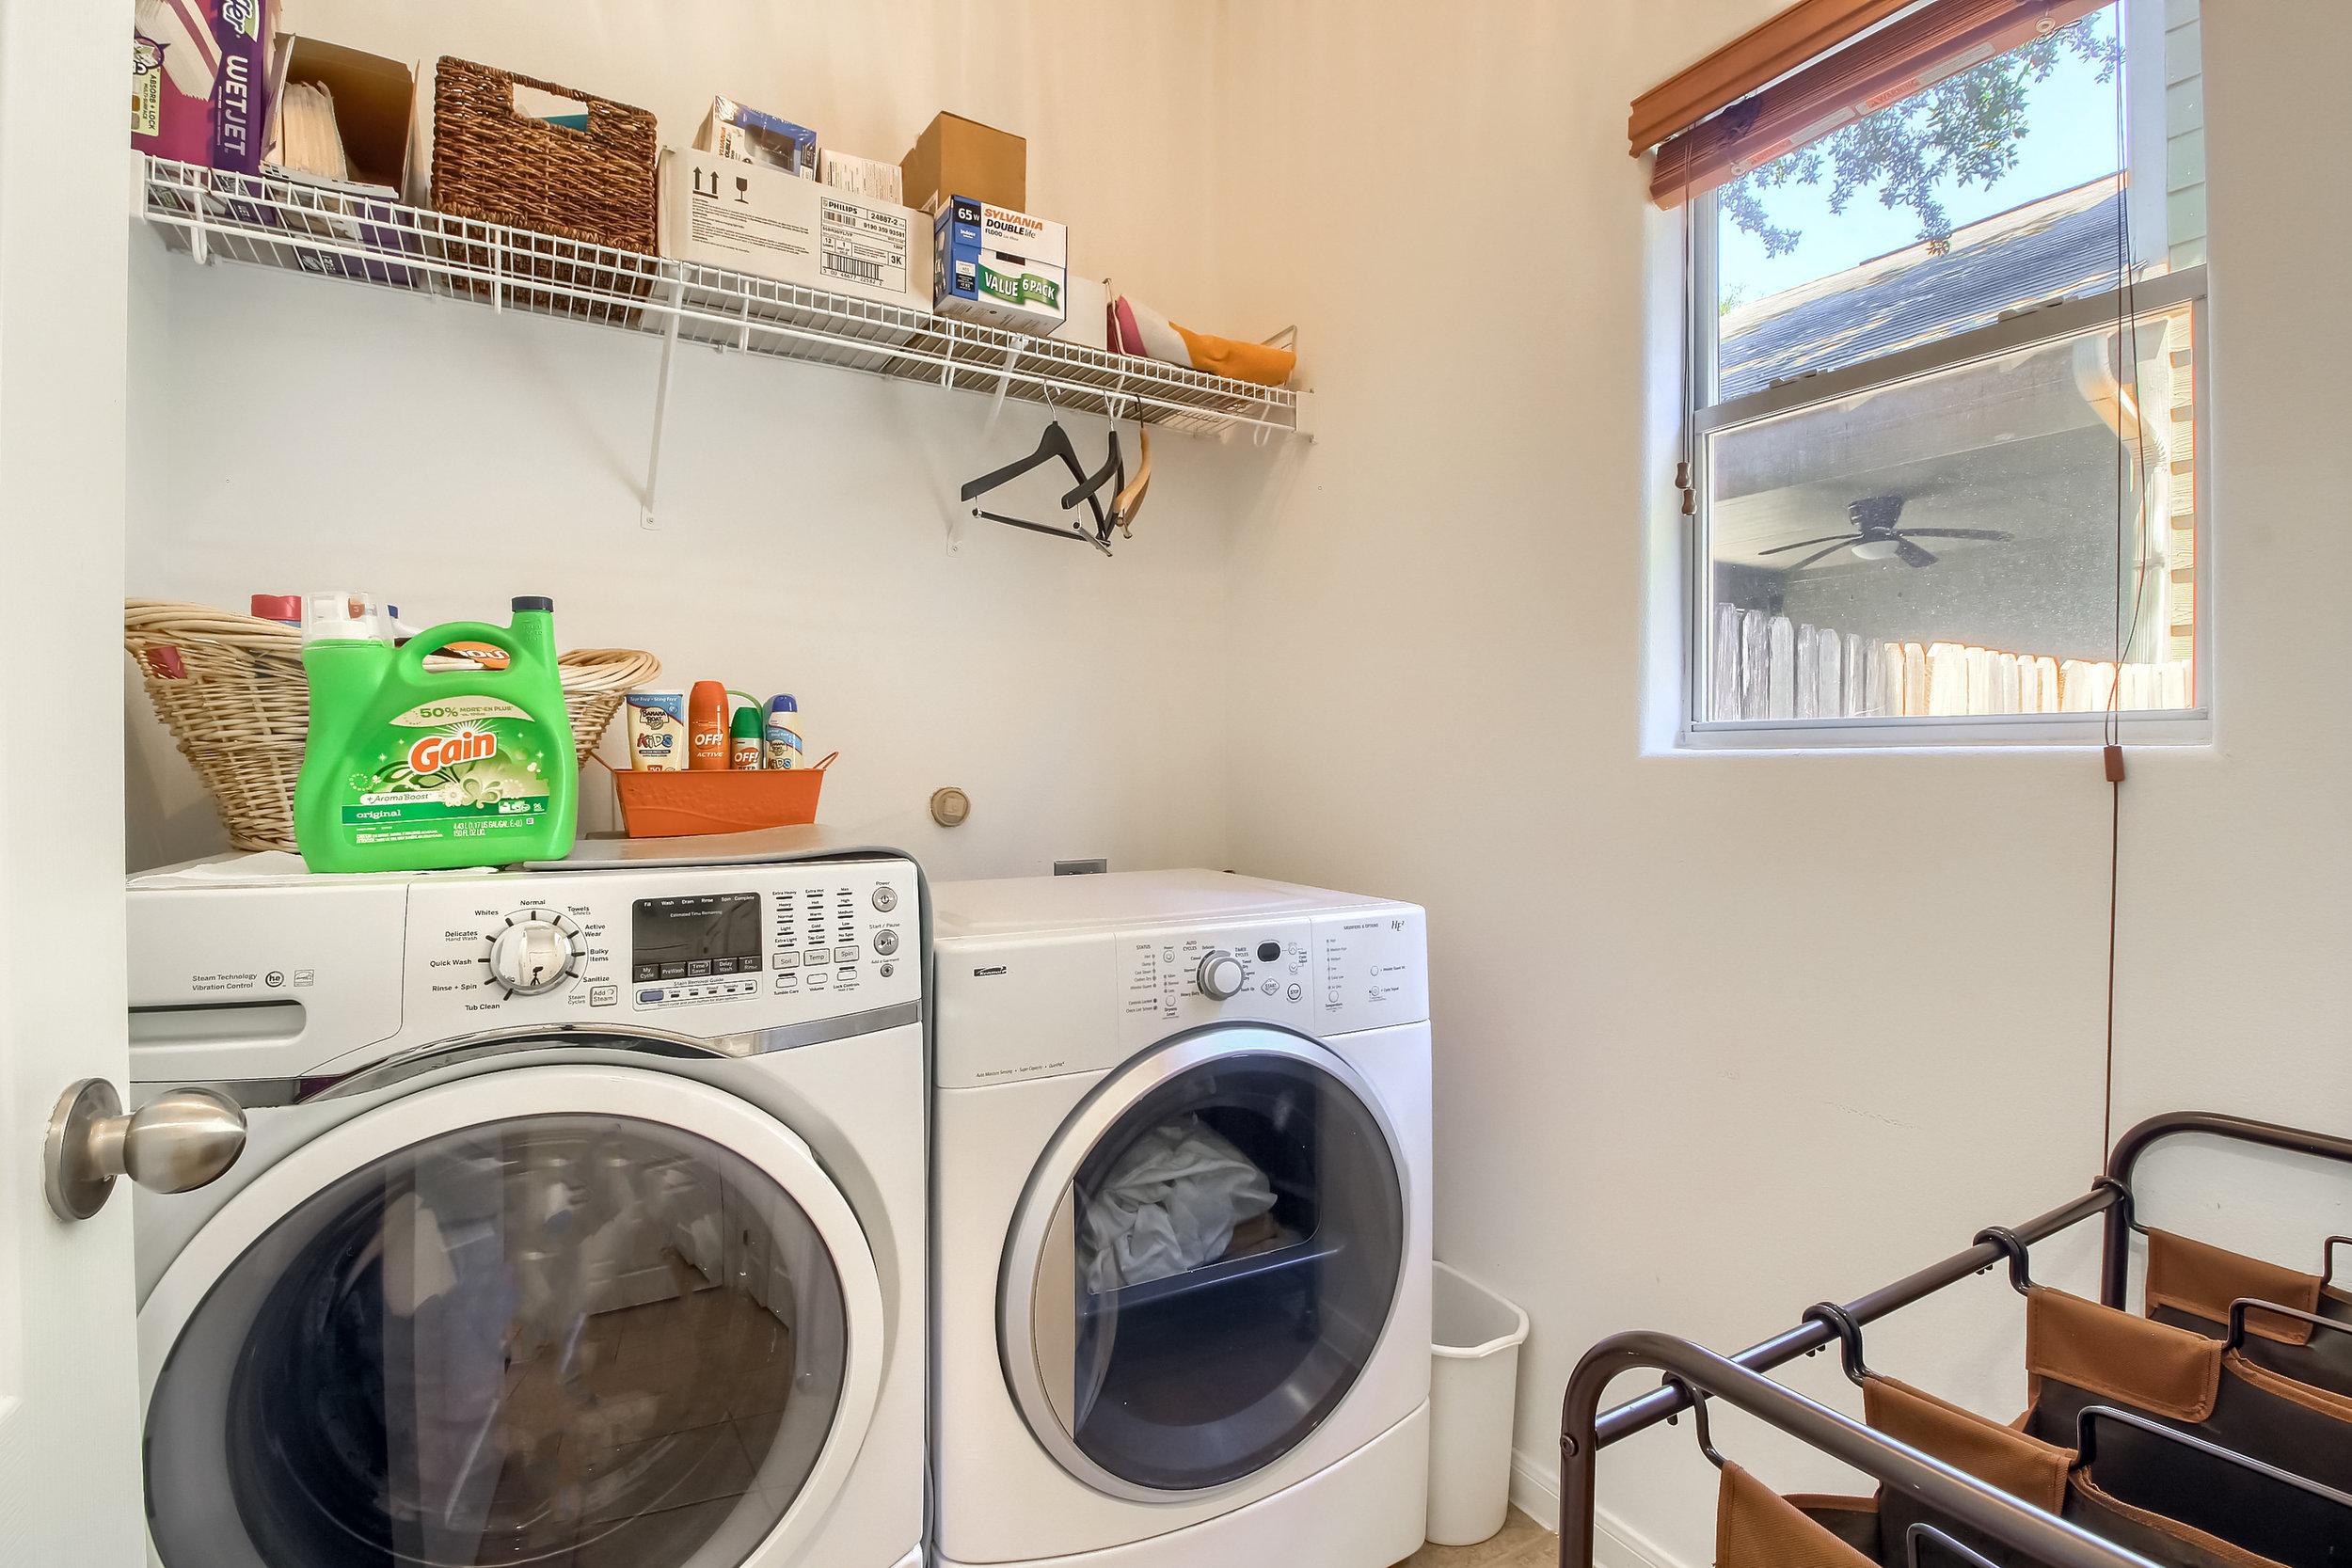 13_Laundry_Room_IMG_8848.JPG